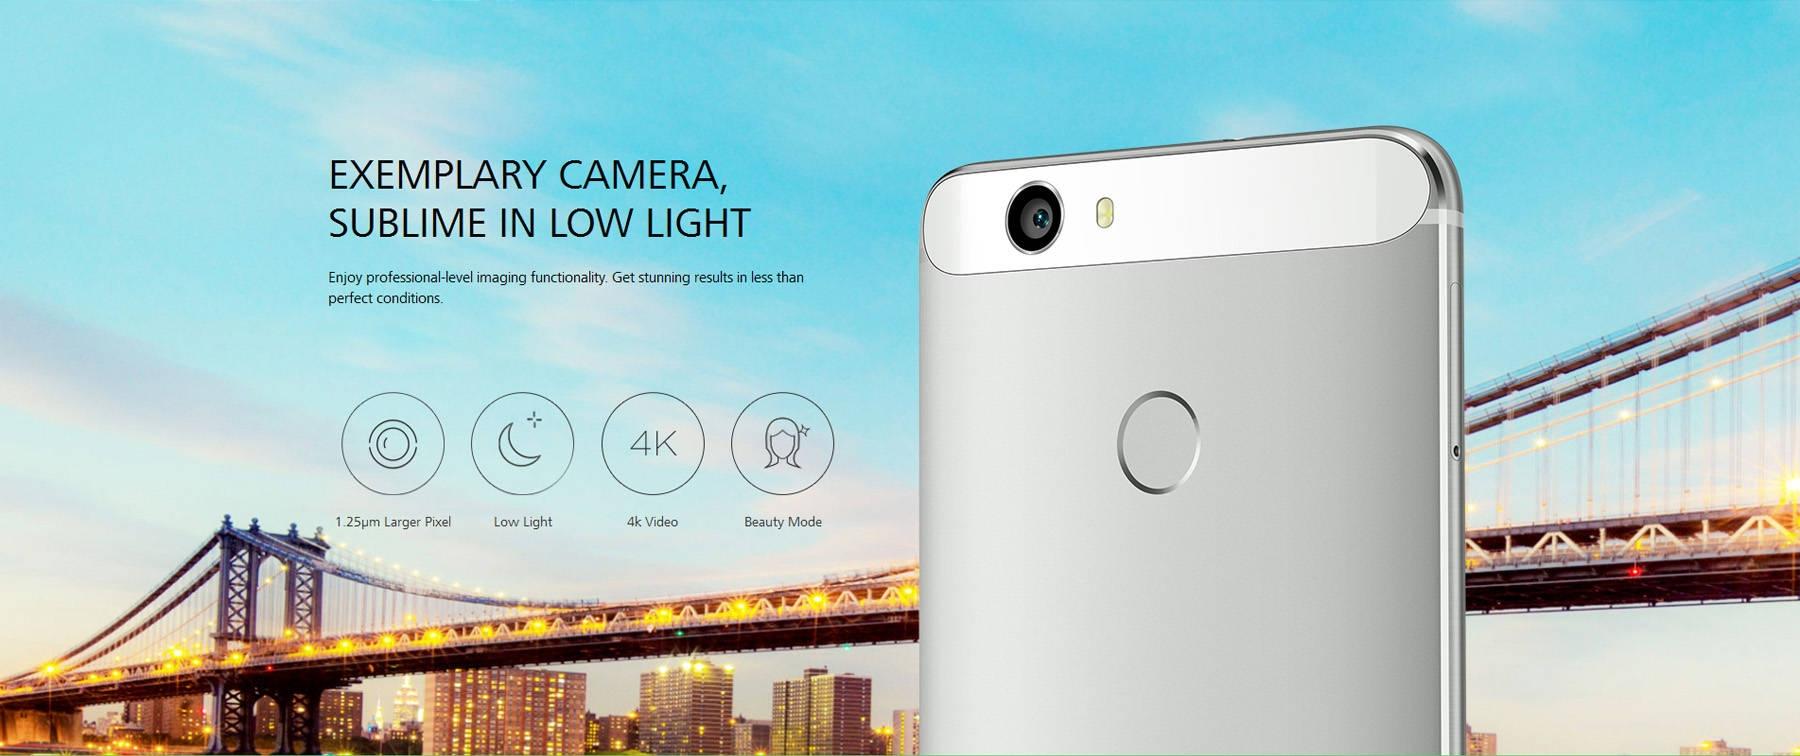 HUAWEI nova ( CAZ-AL10 ) 5.0 inch Android 6.0 4G Smartphone FHD In-Cell Screen Snapdragon 625 Octa Core 2.0GHz 4GB RAM 64GB ROM Type-C Fingerprint Sensor